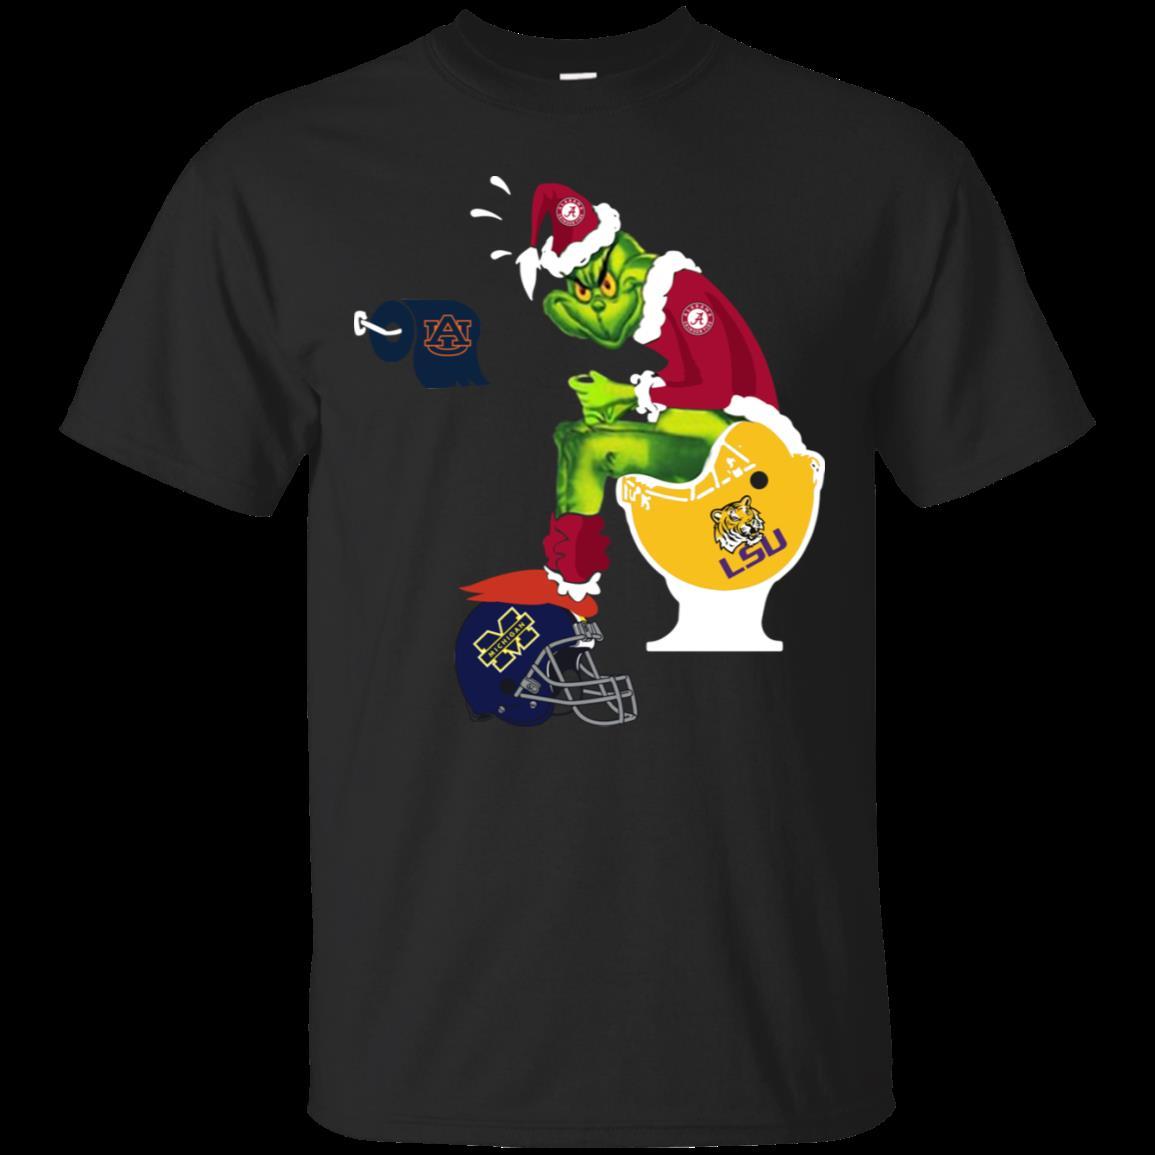 Alabama Crimson Tide Santa Grinch Toilet Shirt Cotton Shirt